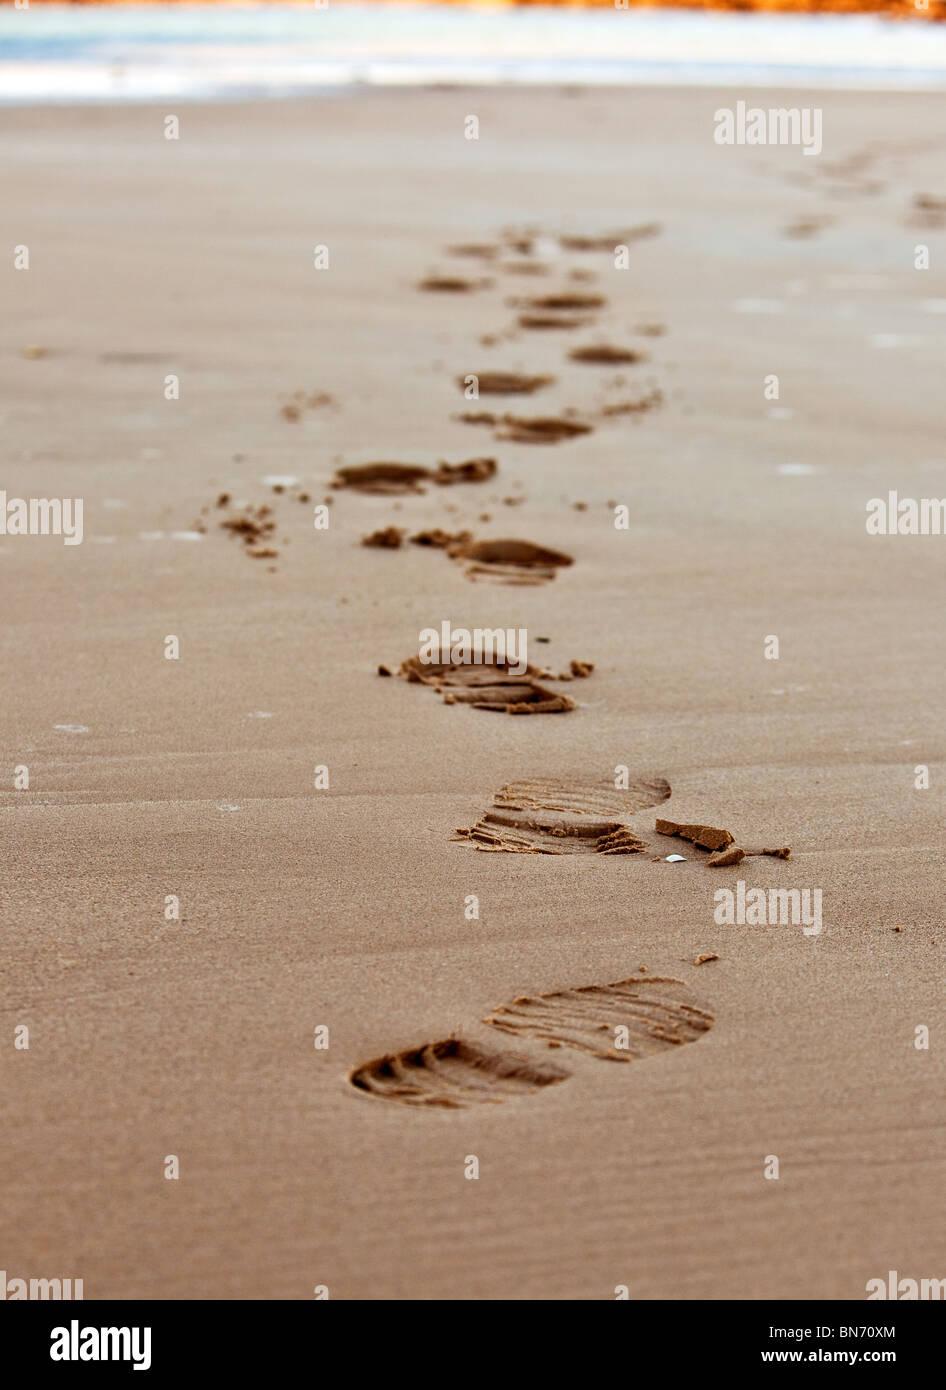 footprints chain on sand of sea coastline. small GRIP - Stock Image